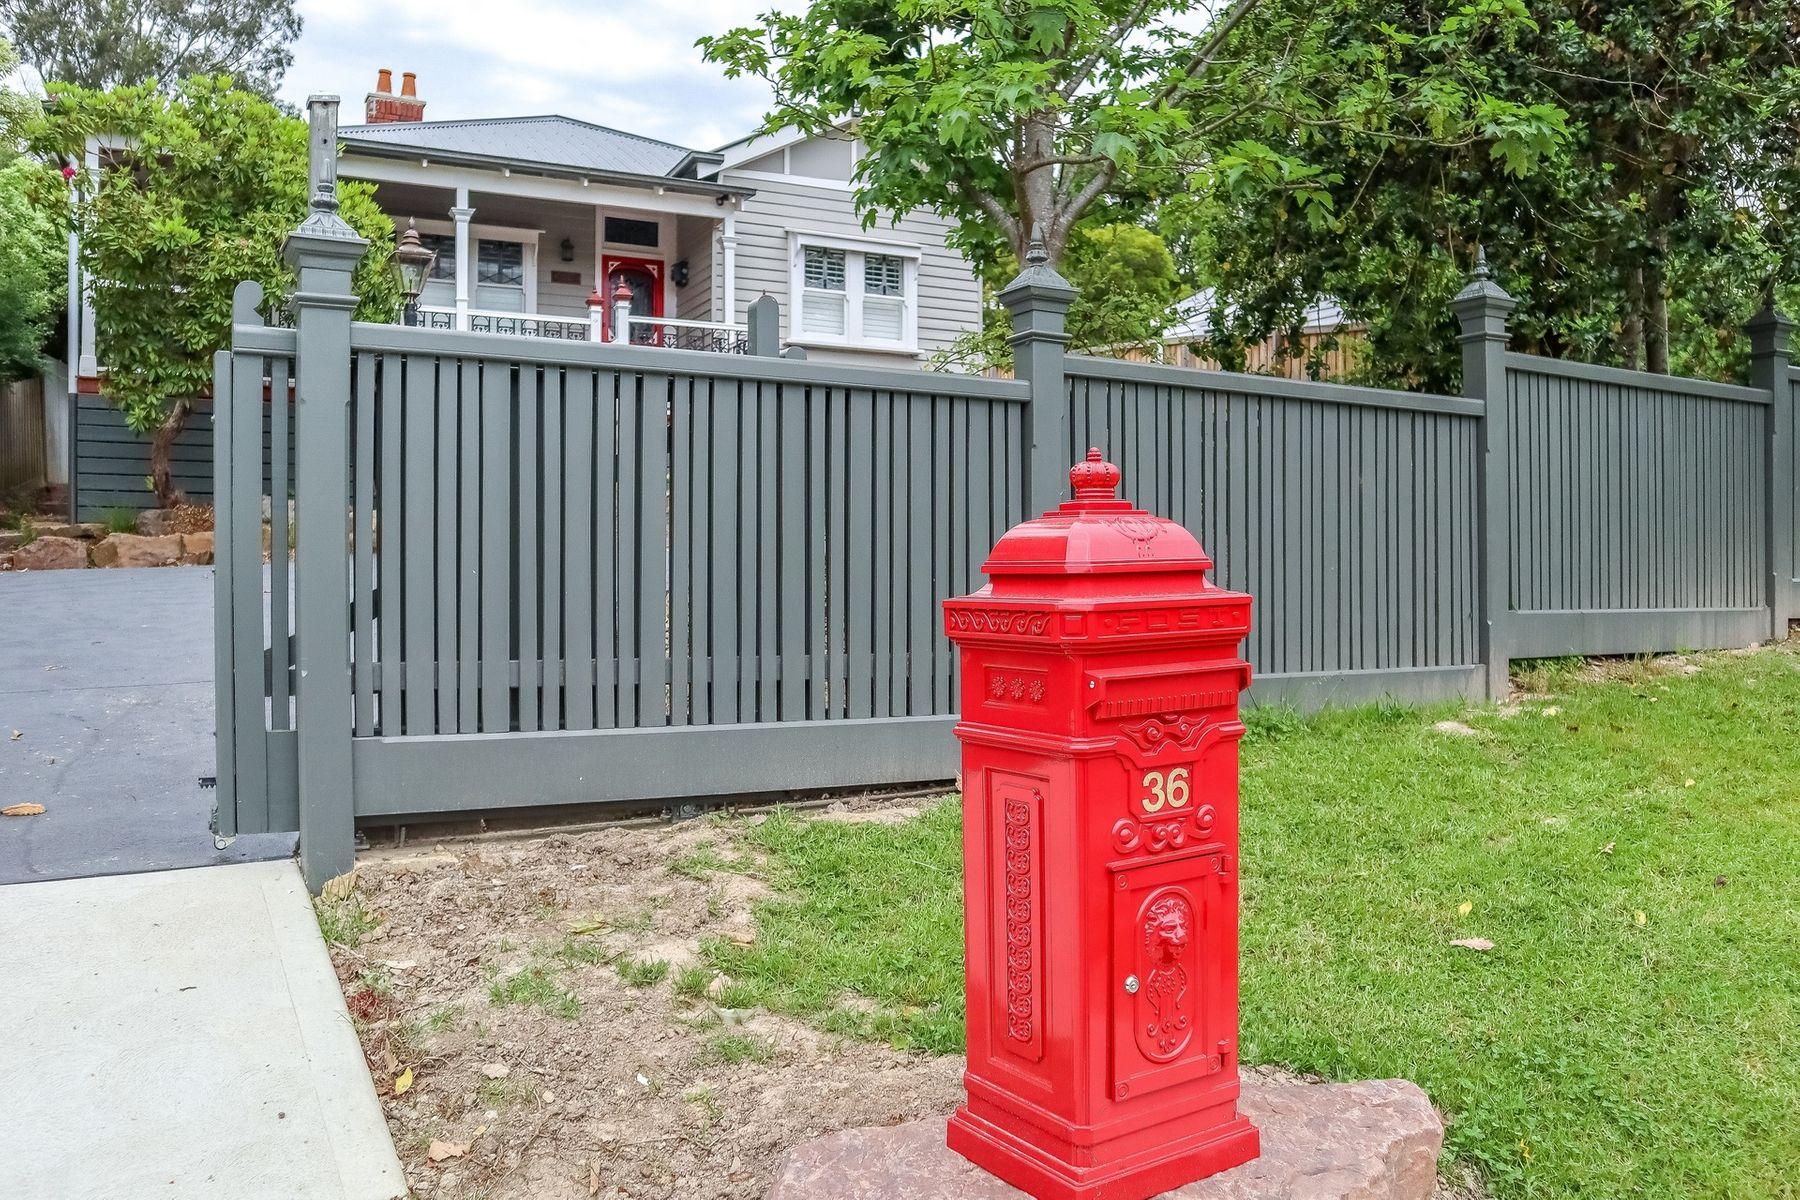 36 St Leonards Road, Healesville, VIC 3777